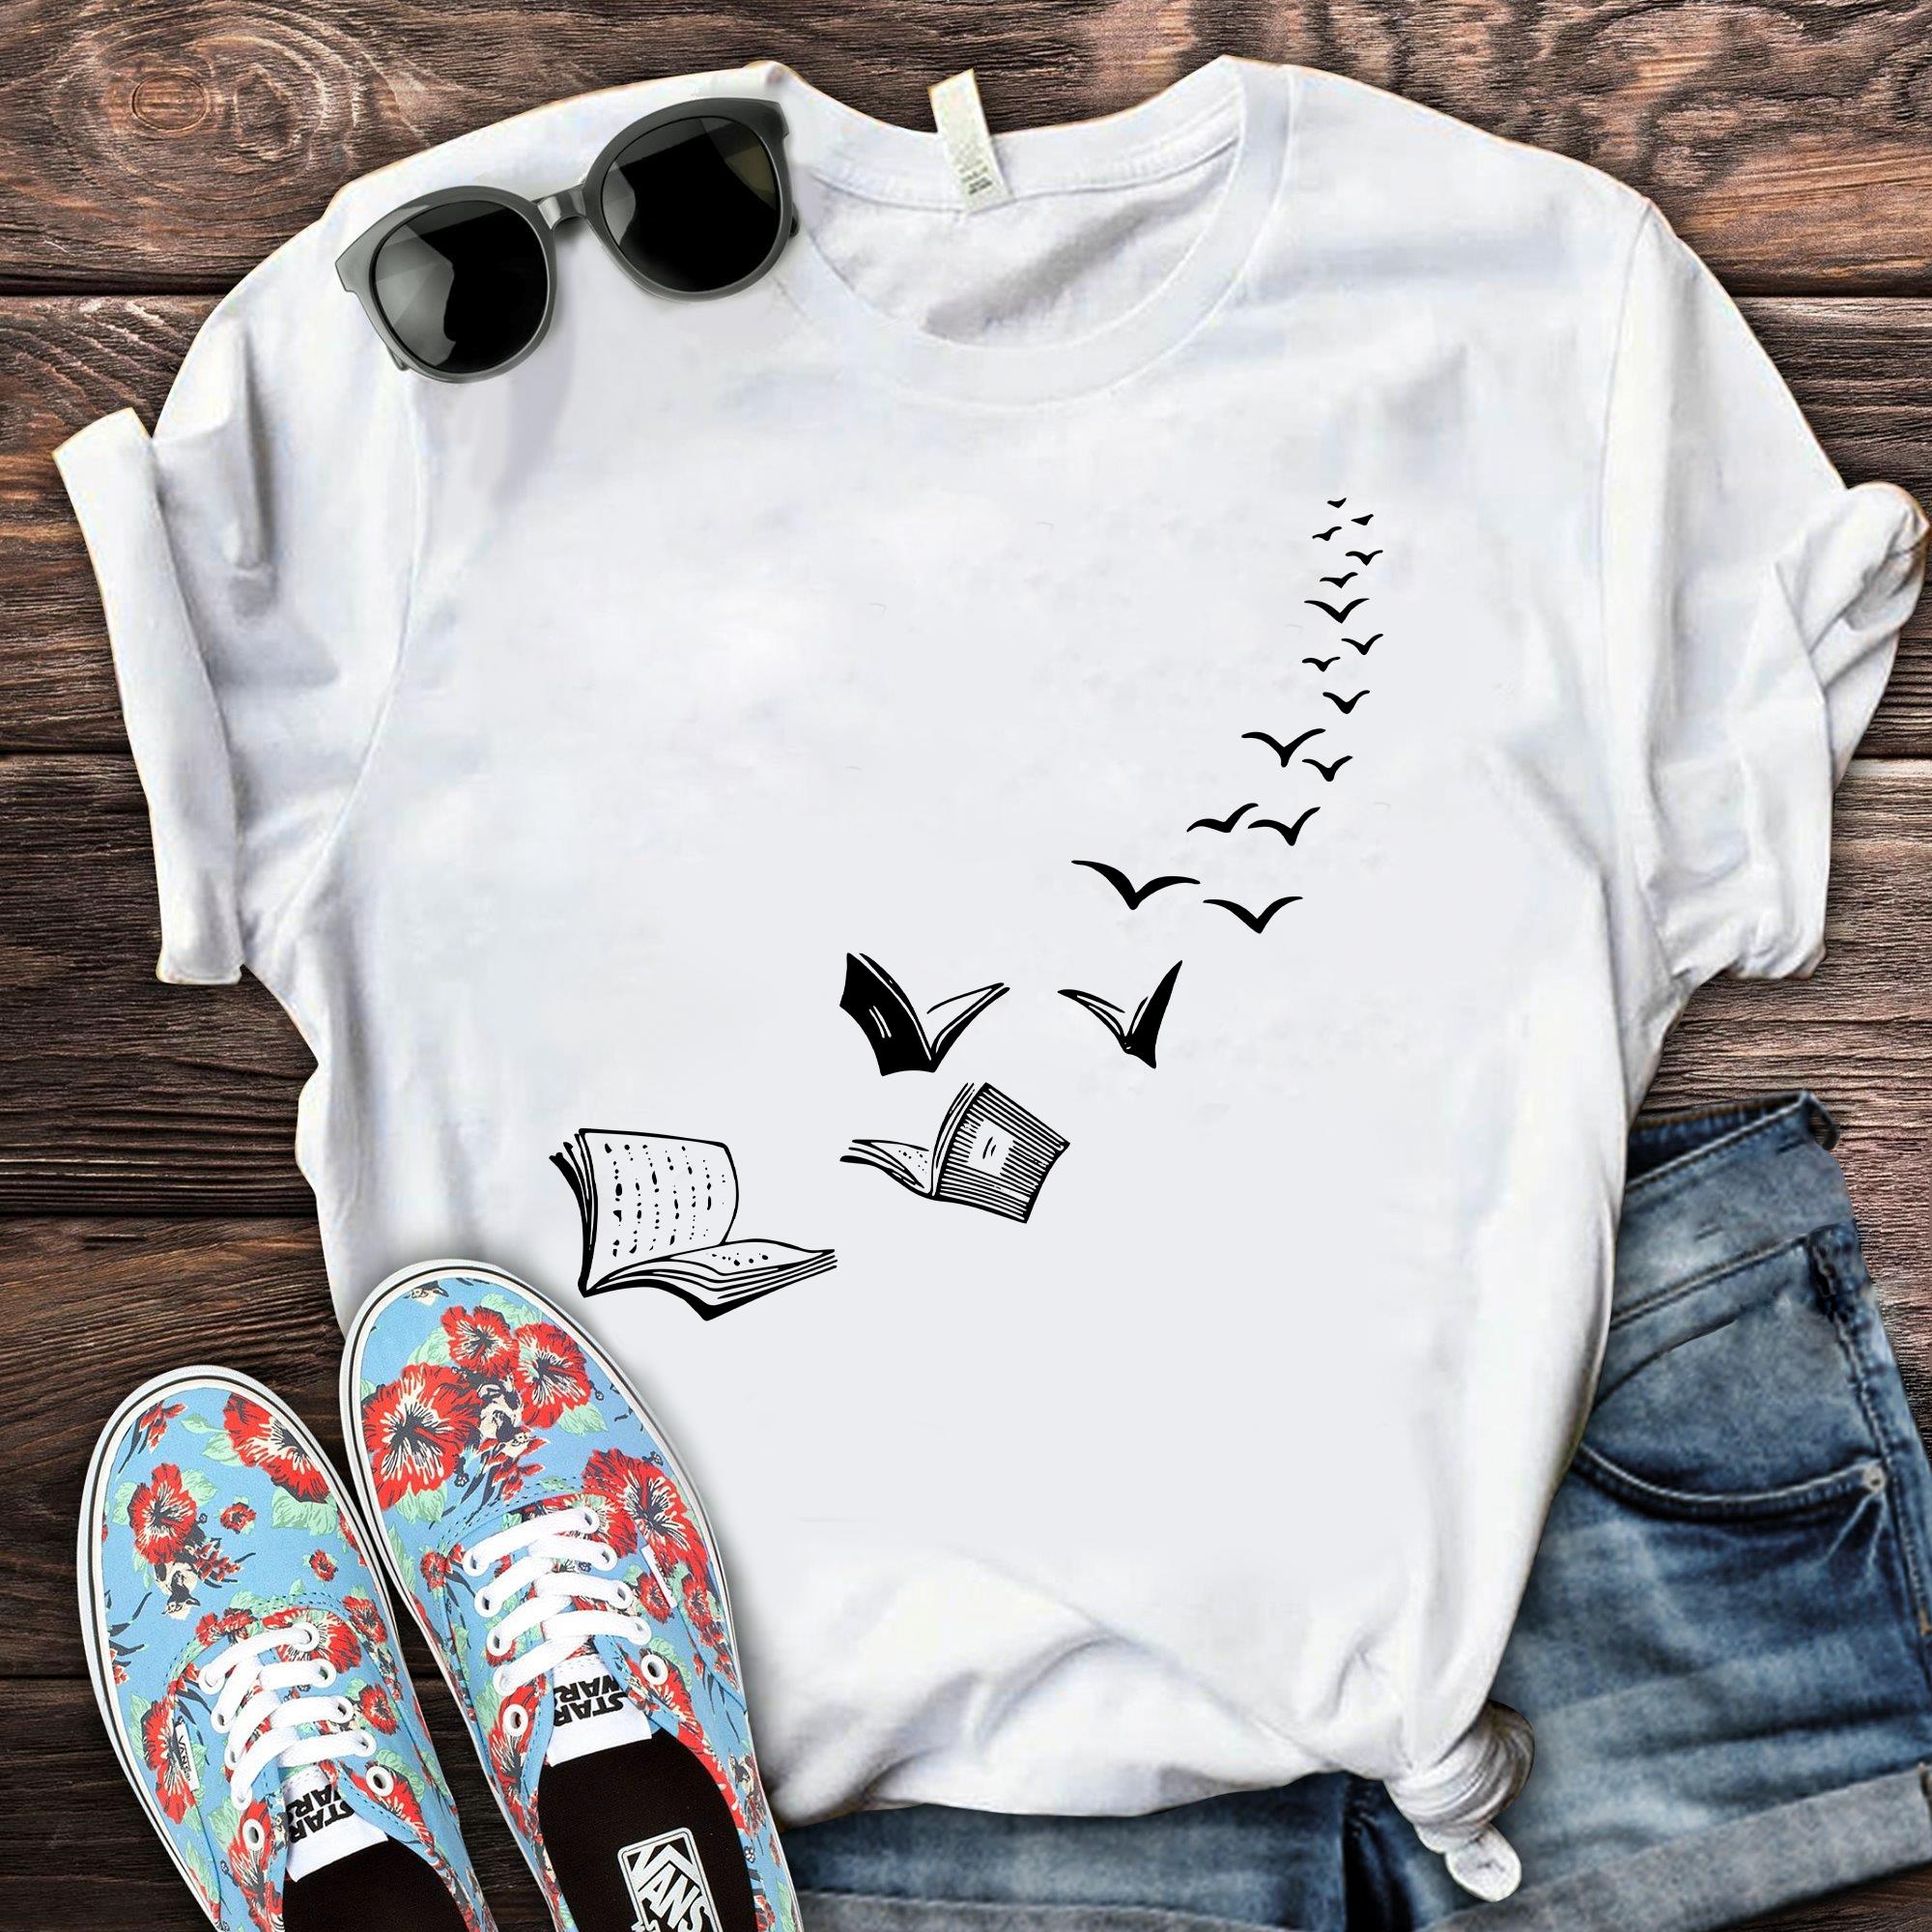 Book Shirt Birds Flying